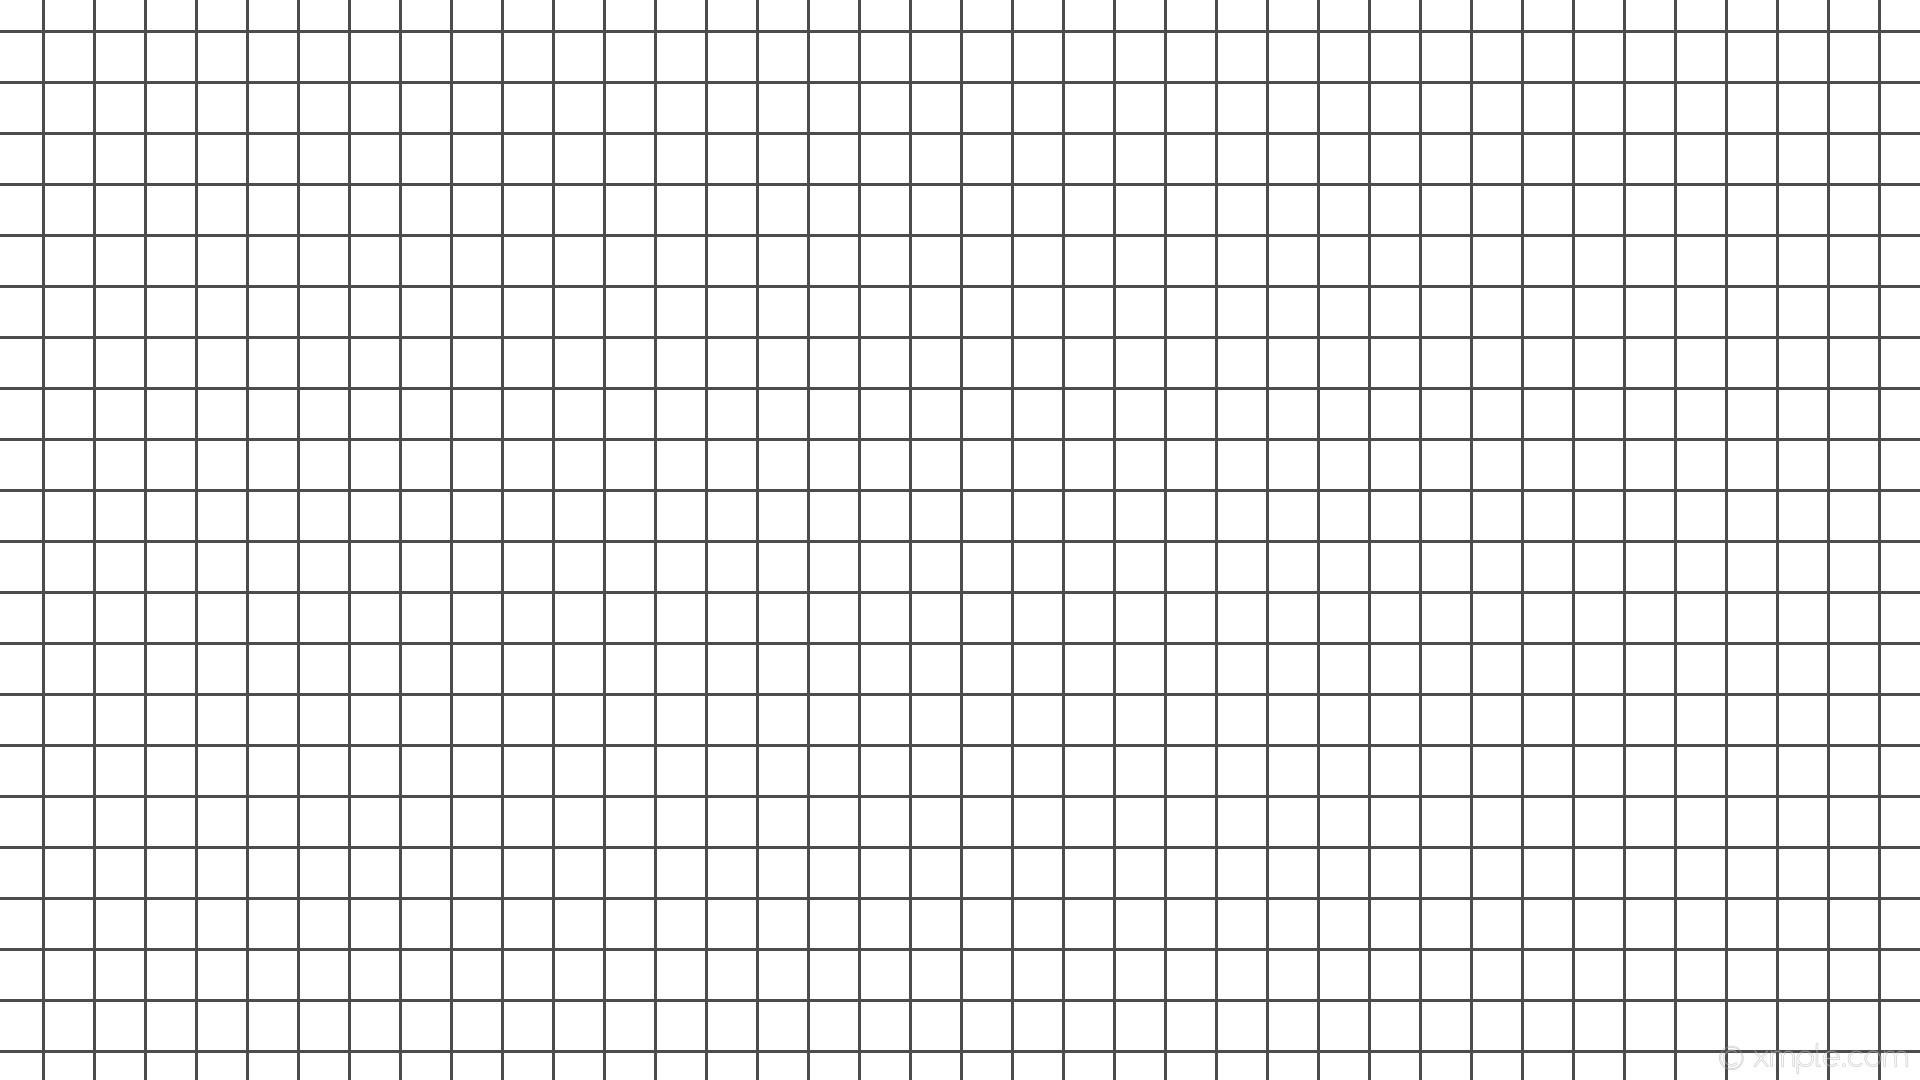 wallpaper white black graph paper grid #ffffff #000000 0° 3px 51px